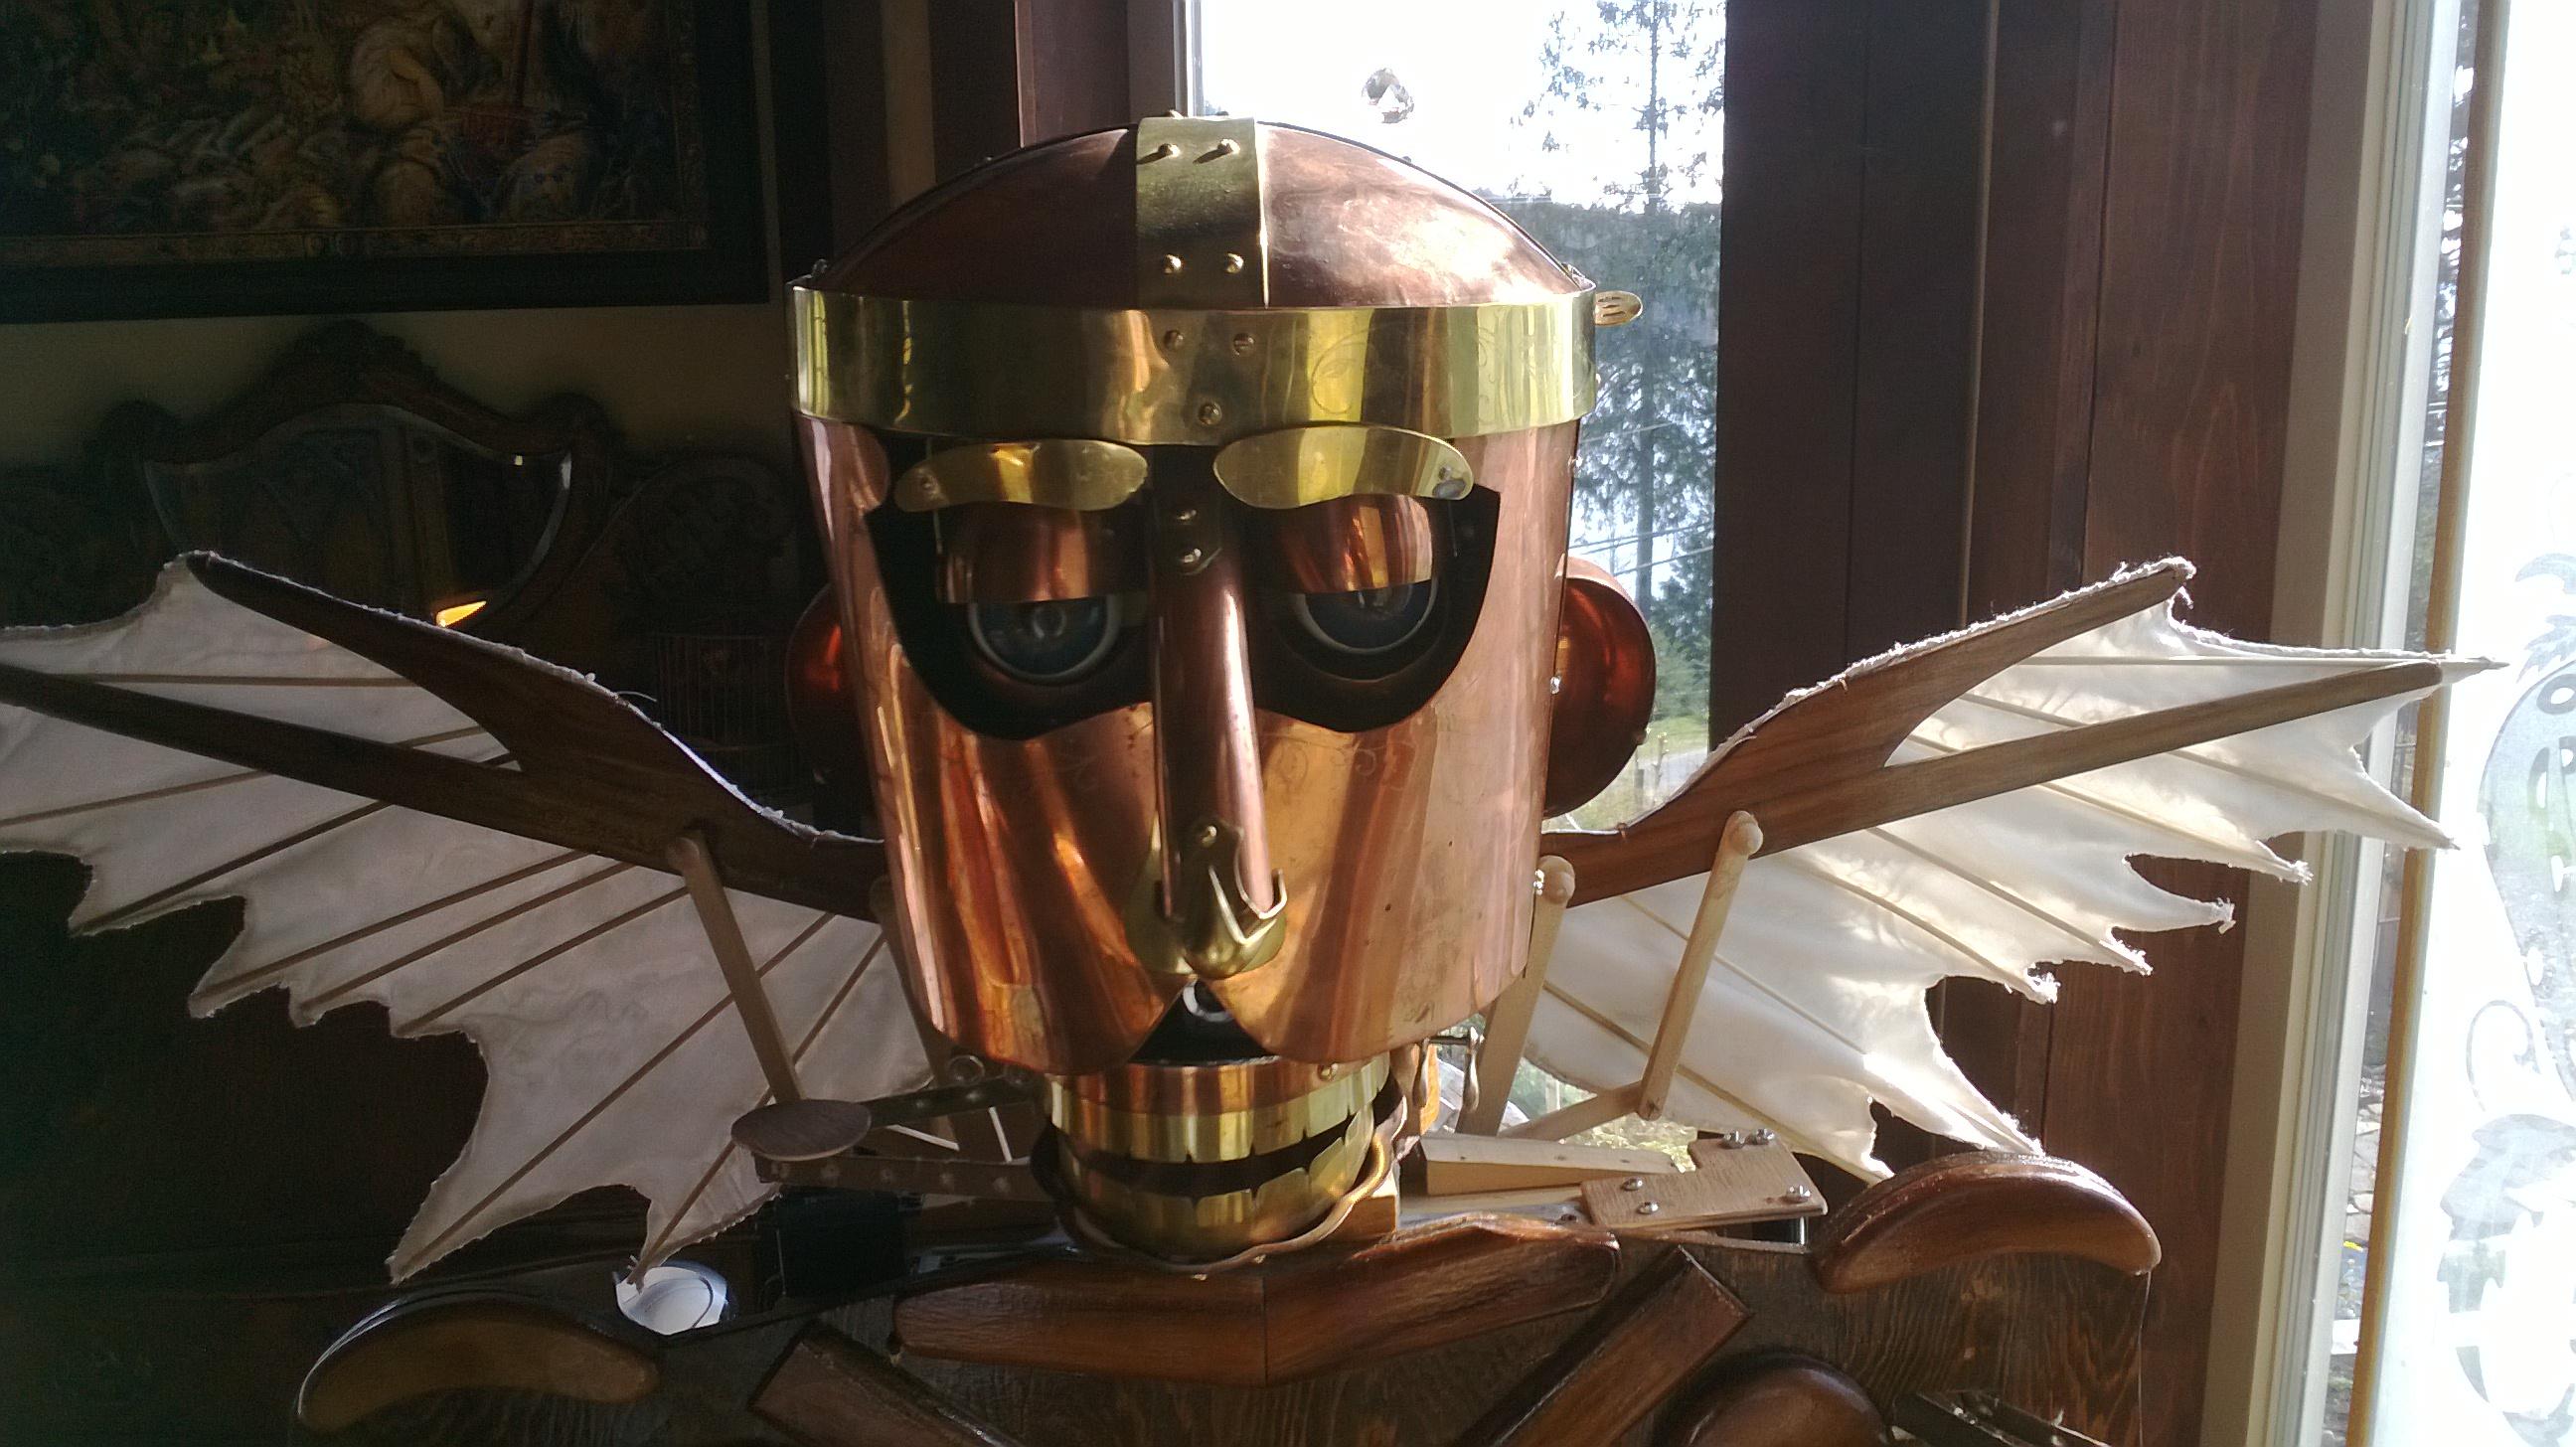 Steampunk style demi-droid EZ-Robot controlled